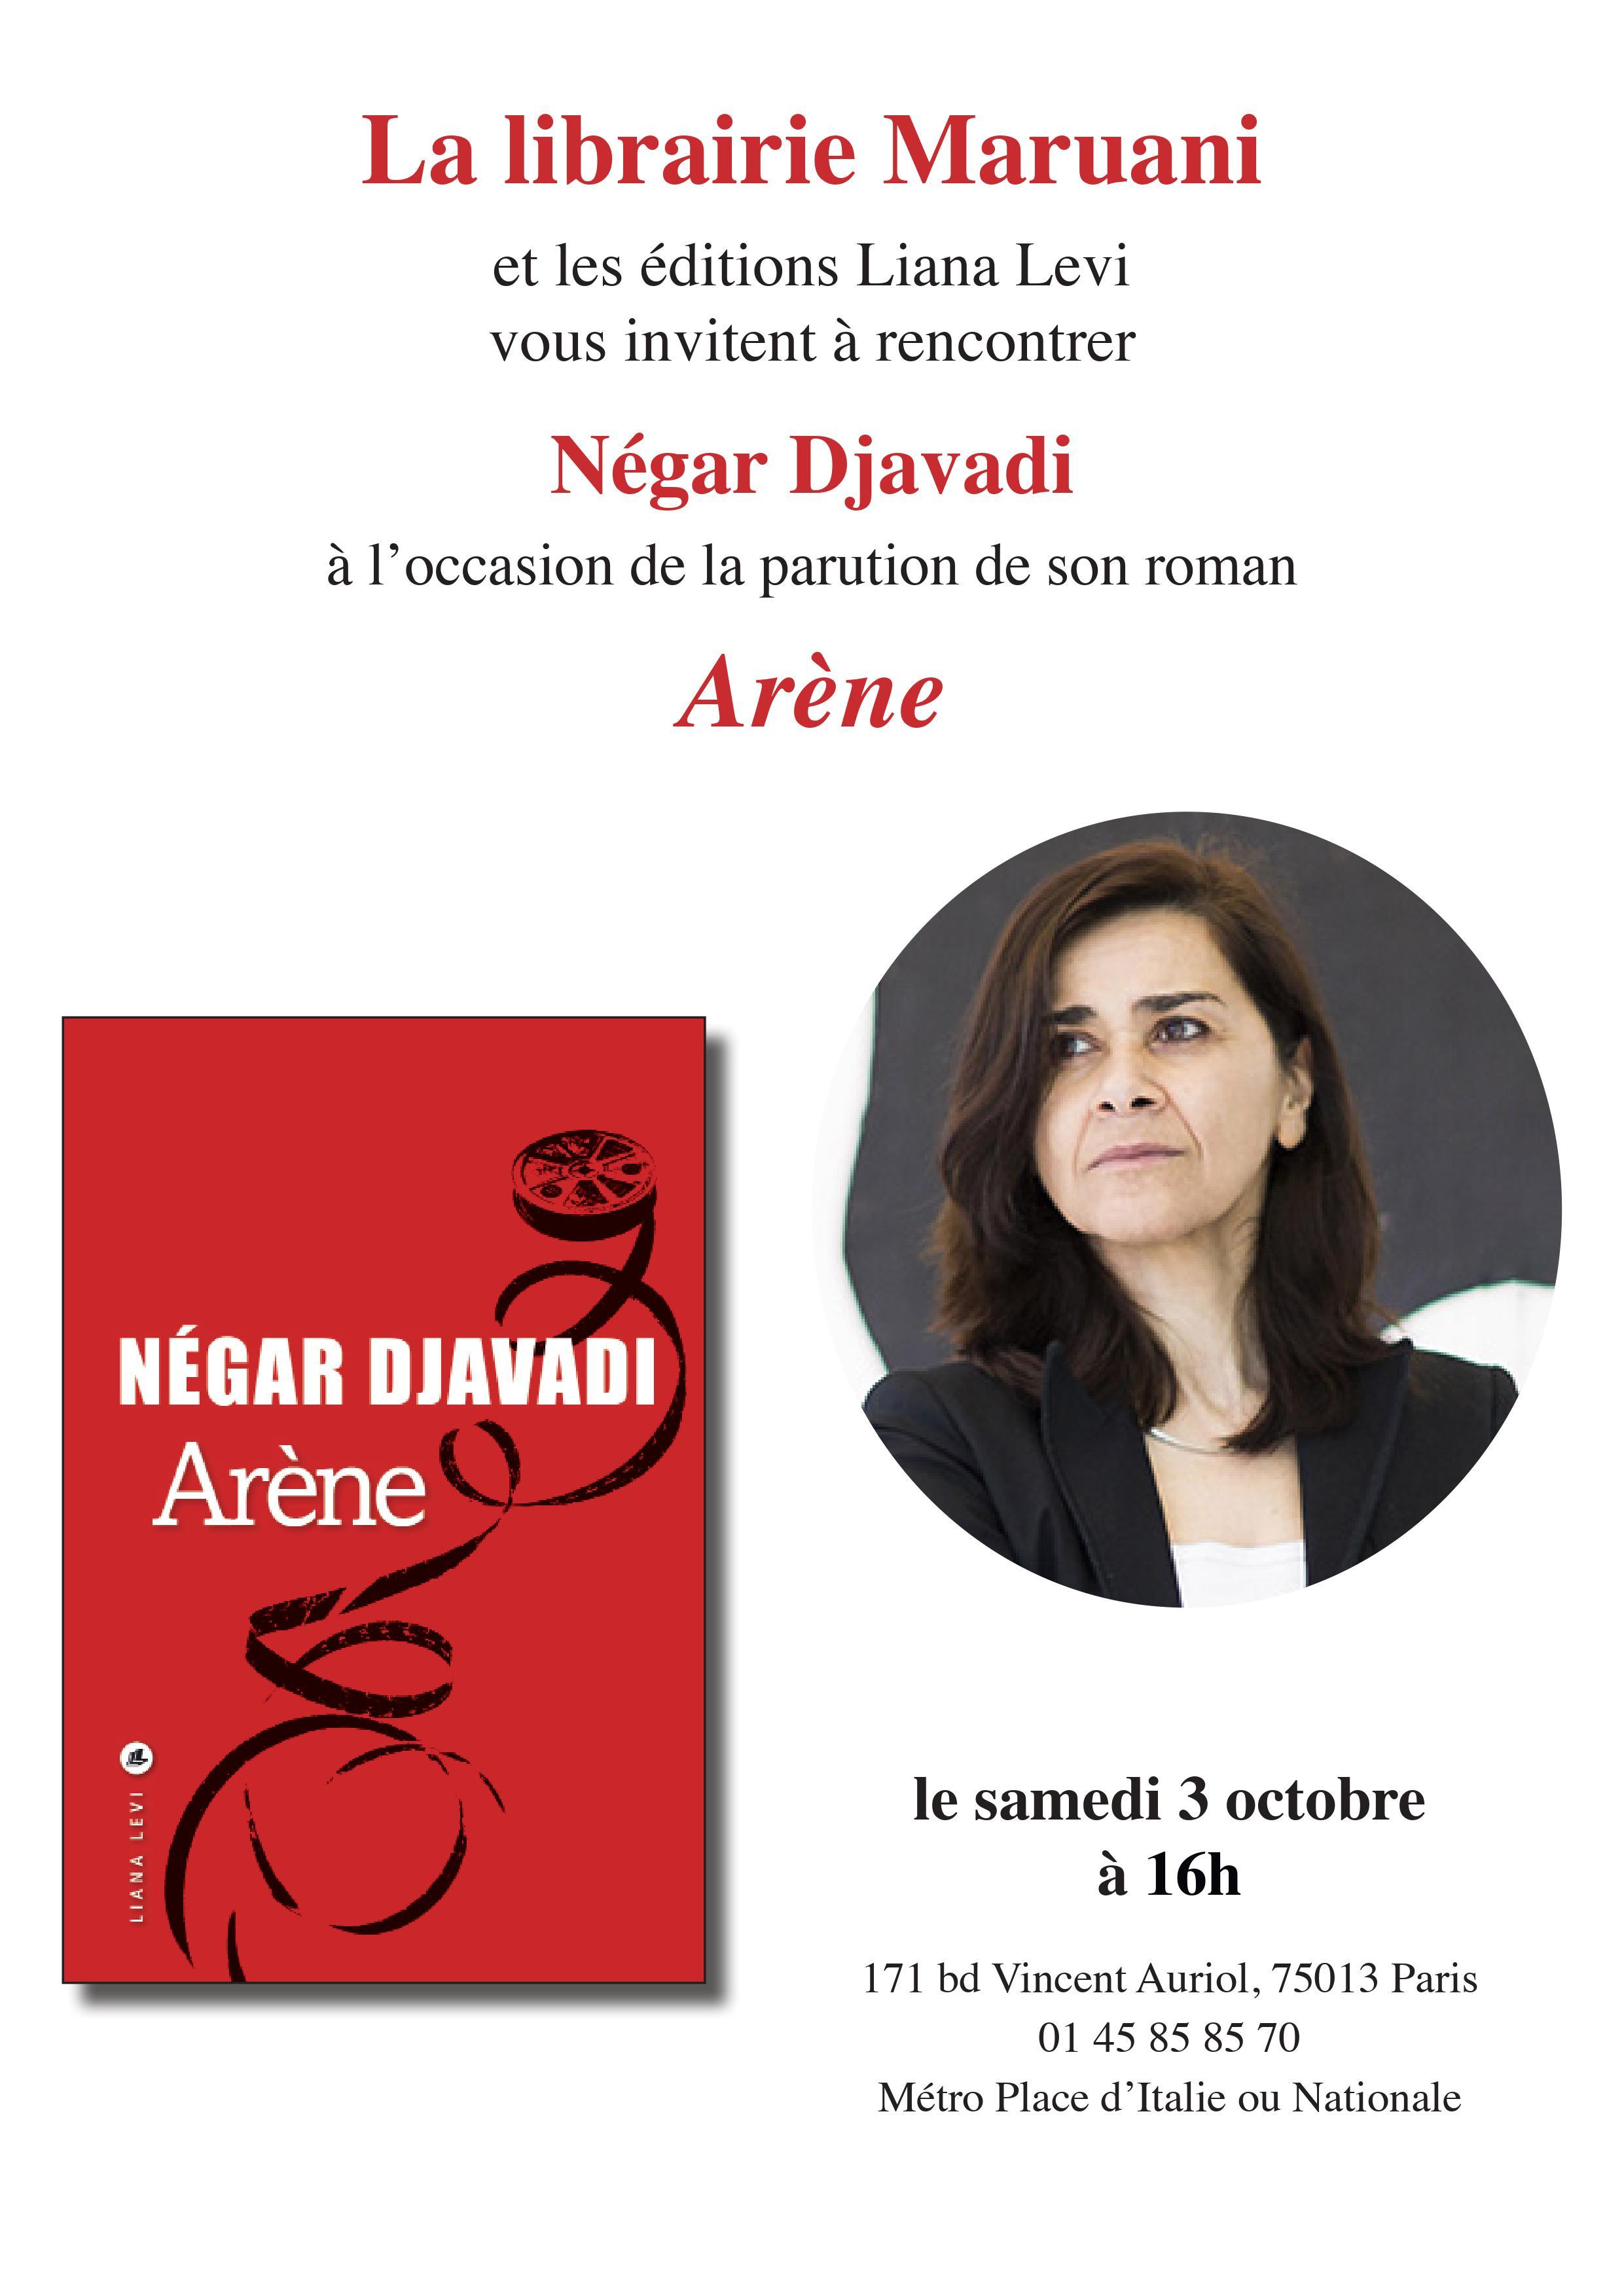 Rencontre Négar Djavadi